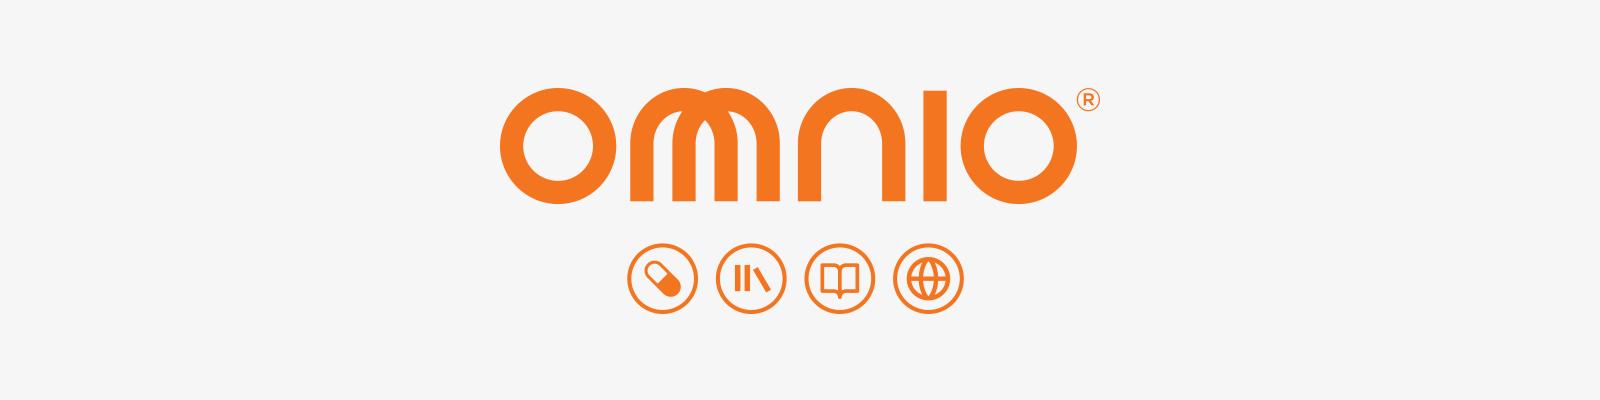 app like omnio cost